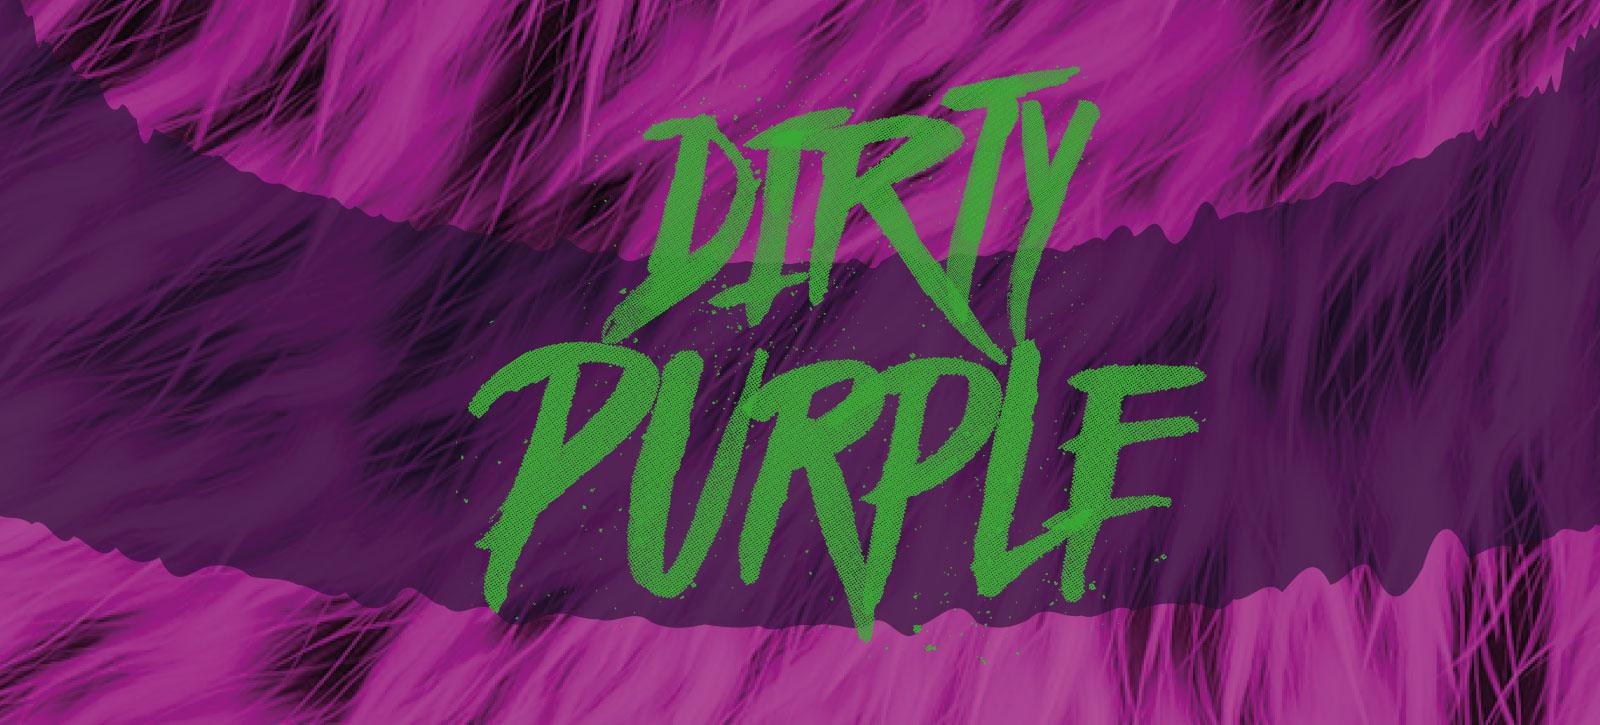 dirty-purple